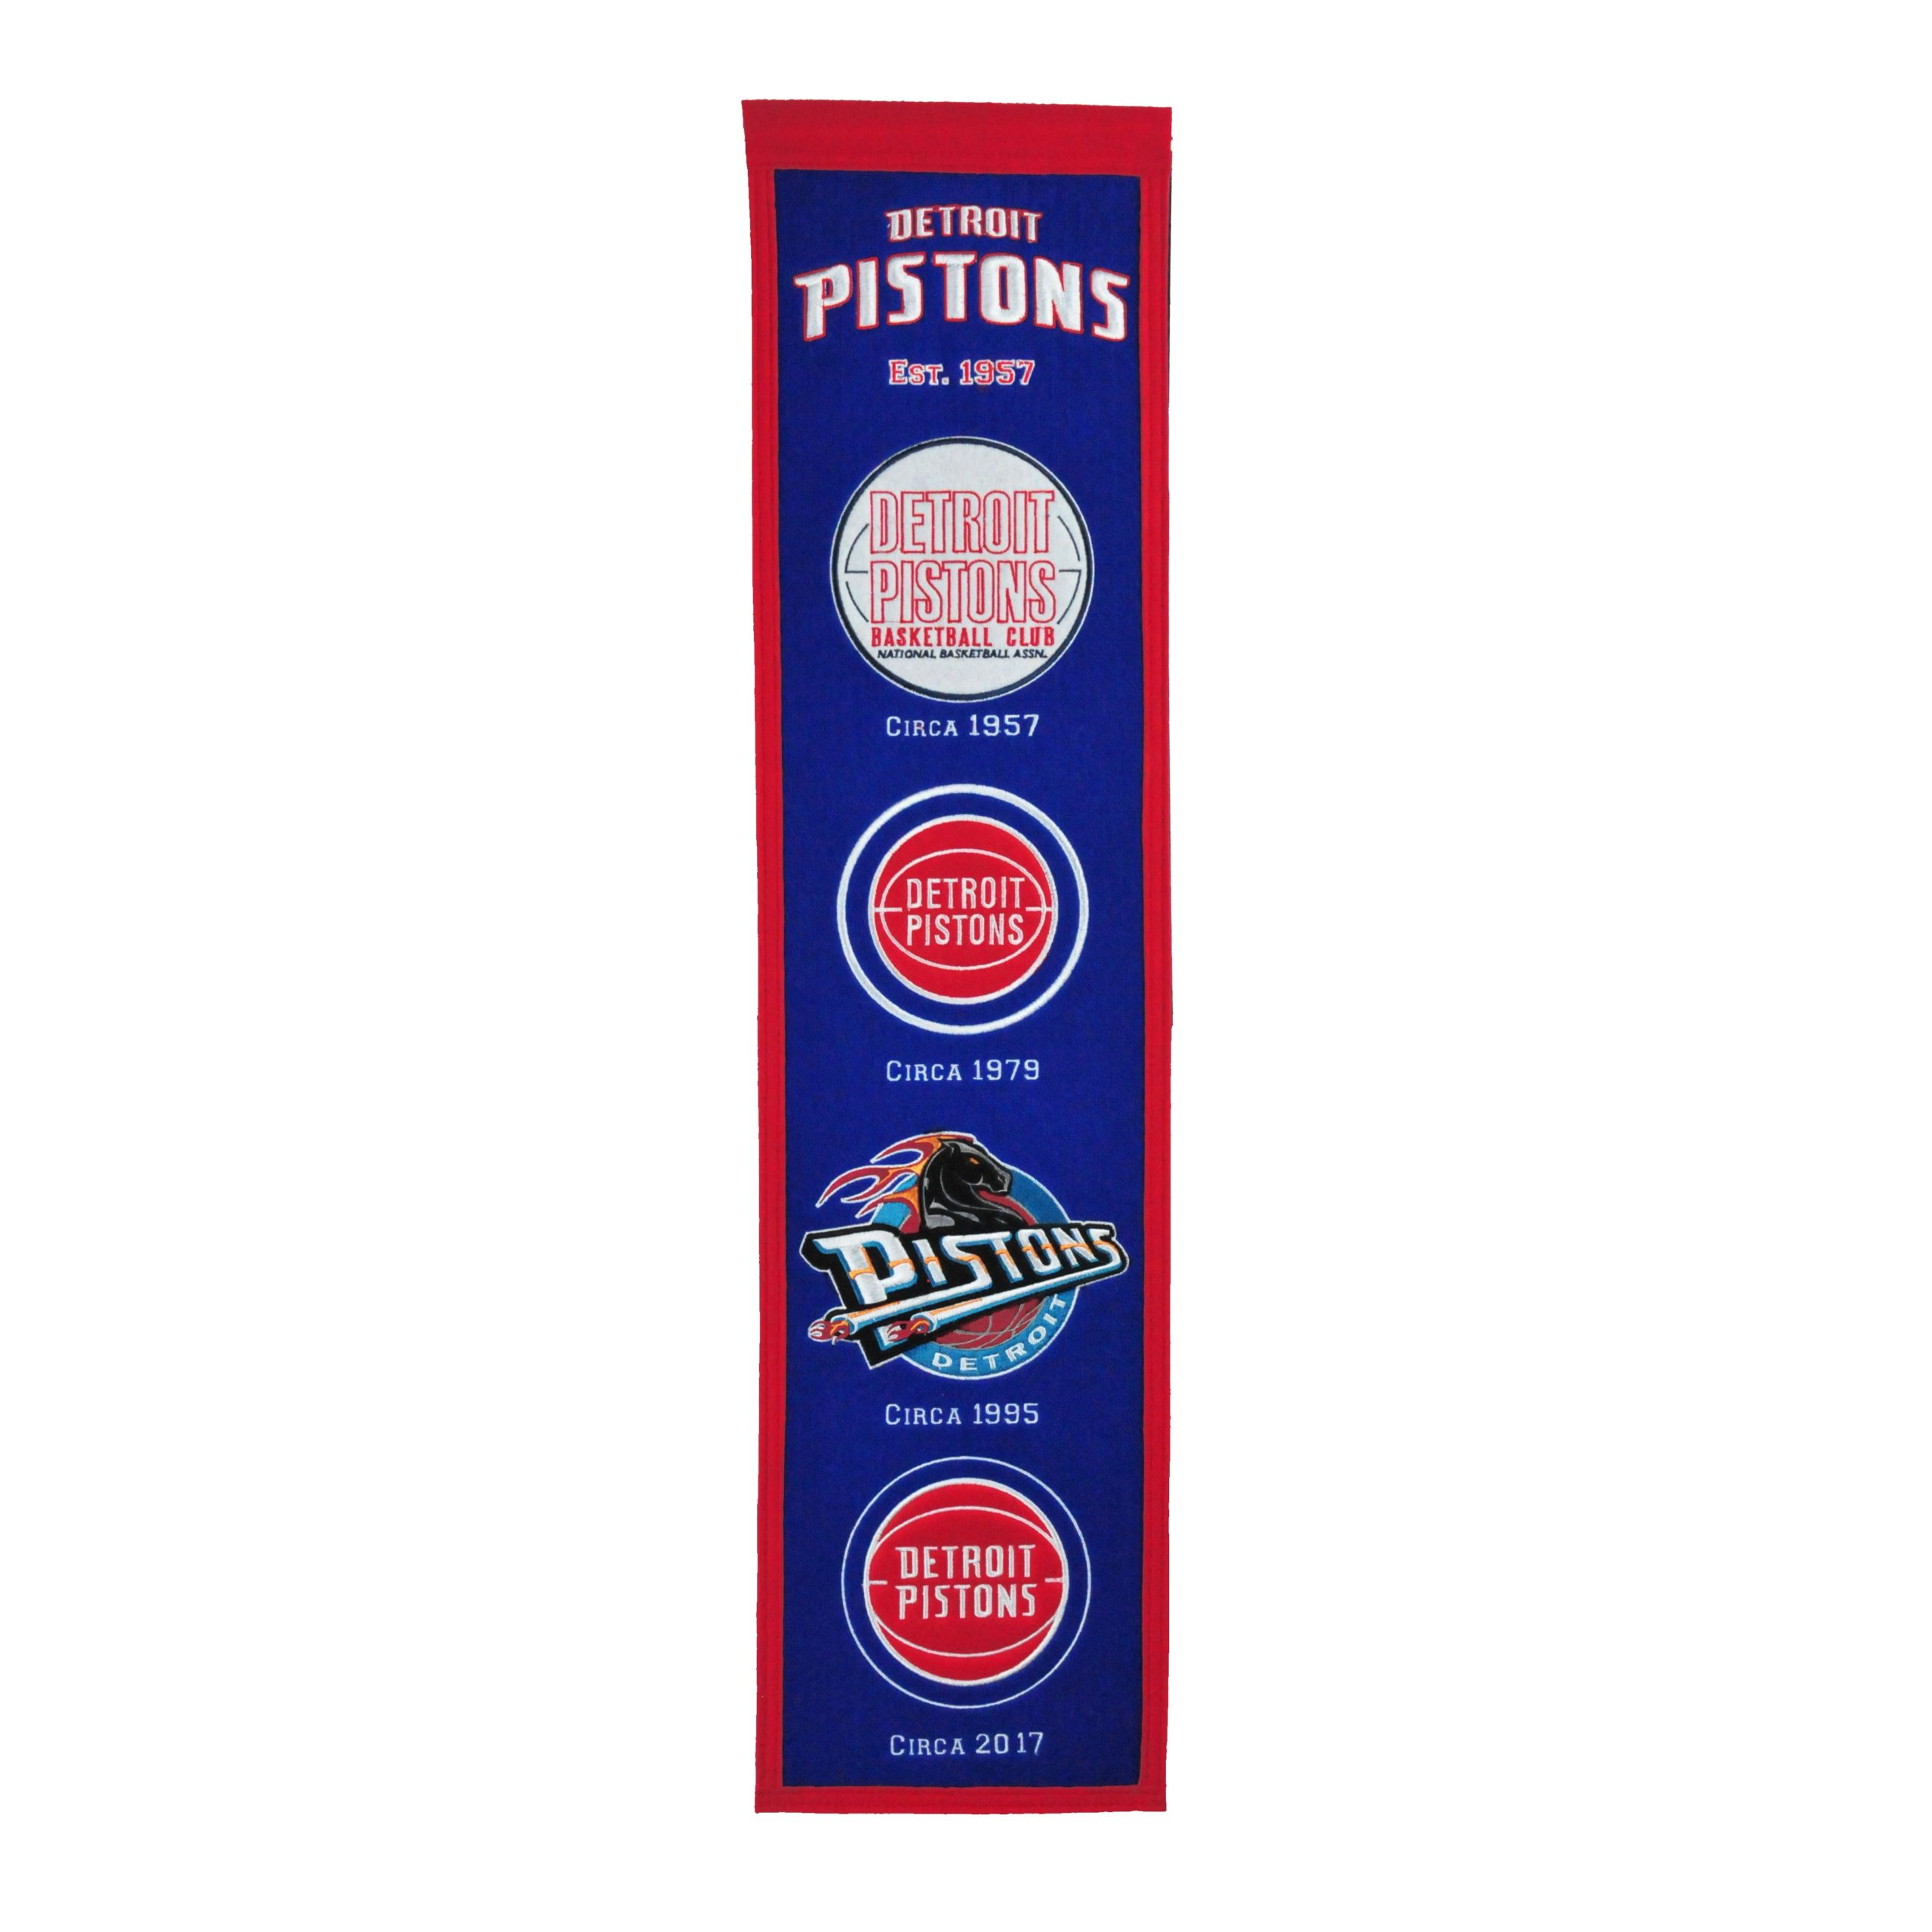 "Detroit Pistons 8"" x 32"" Premium Heritage Banner"